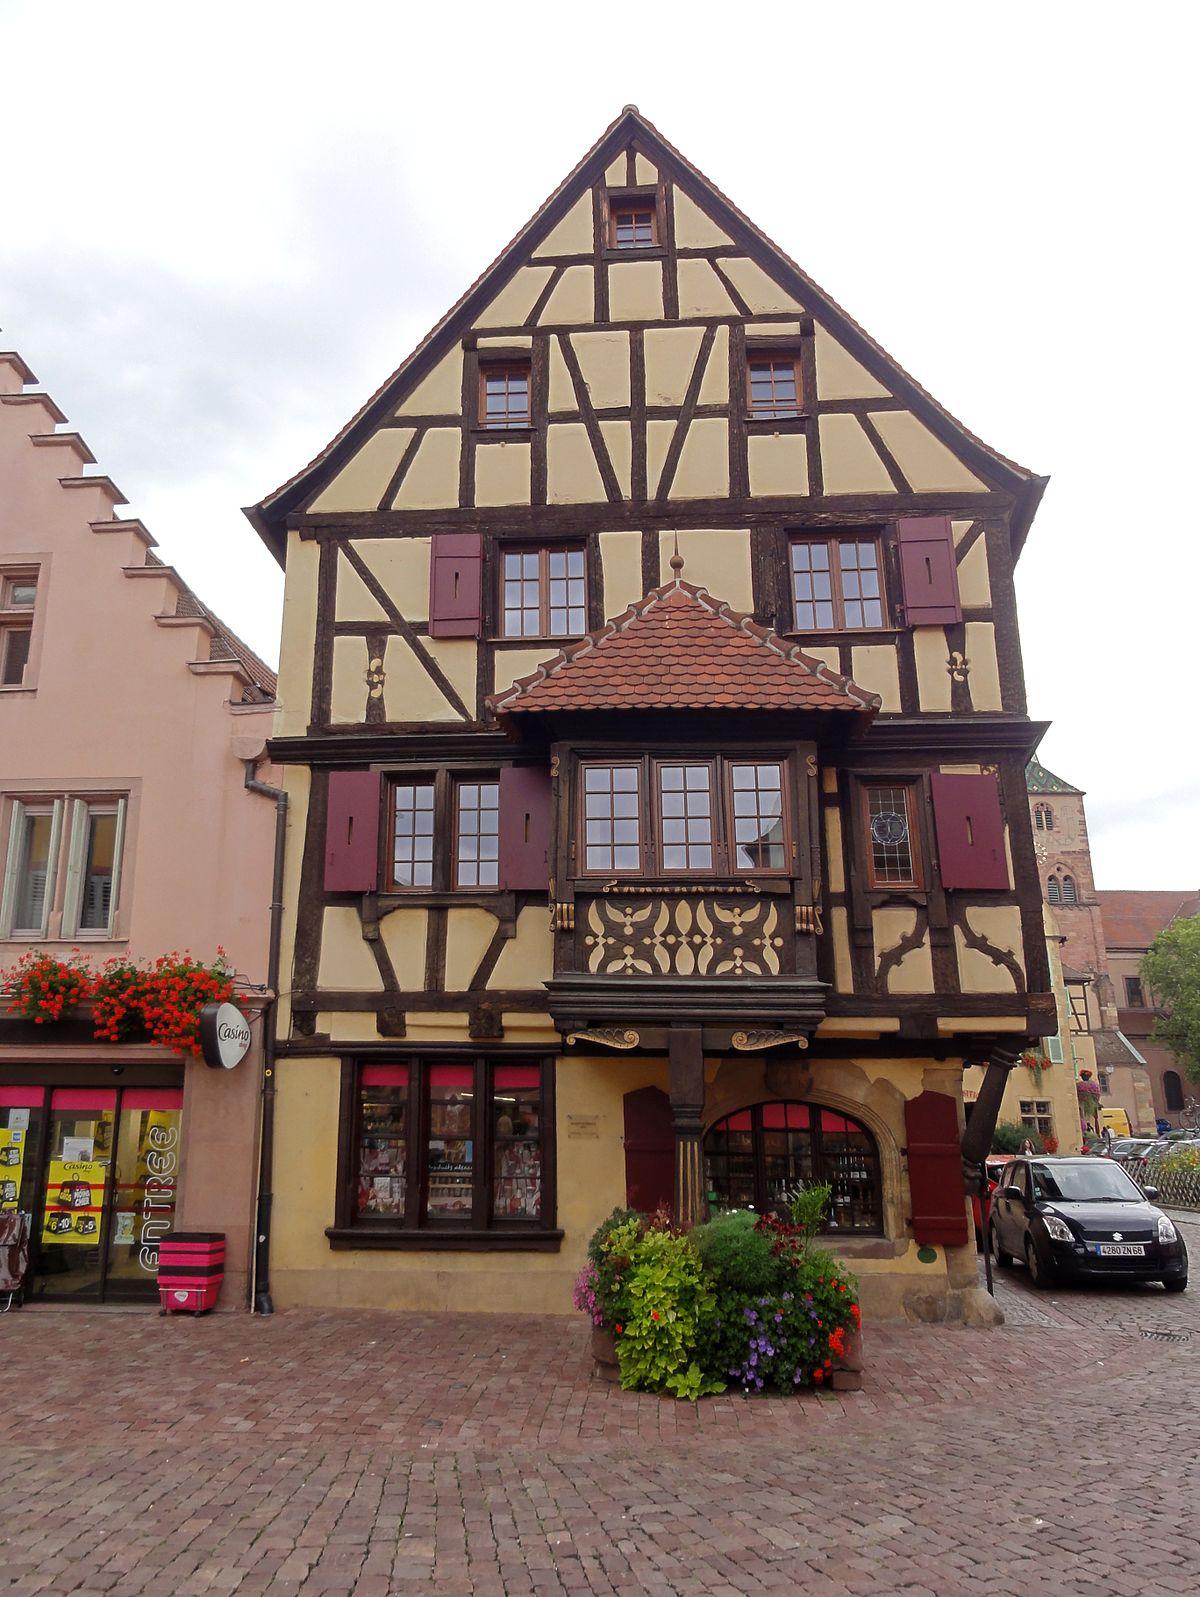 Maison Au 1 Rue Du Conseil Turckheim Wikip Dia